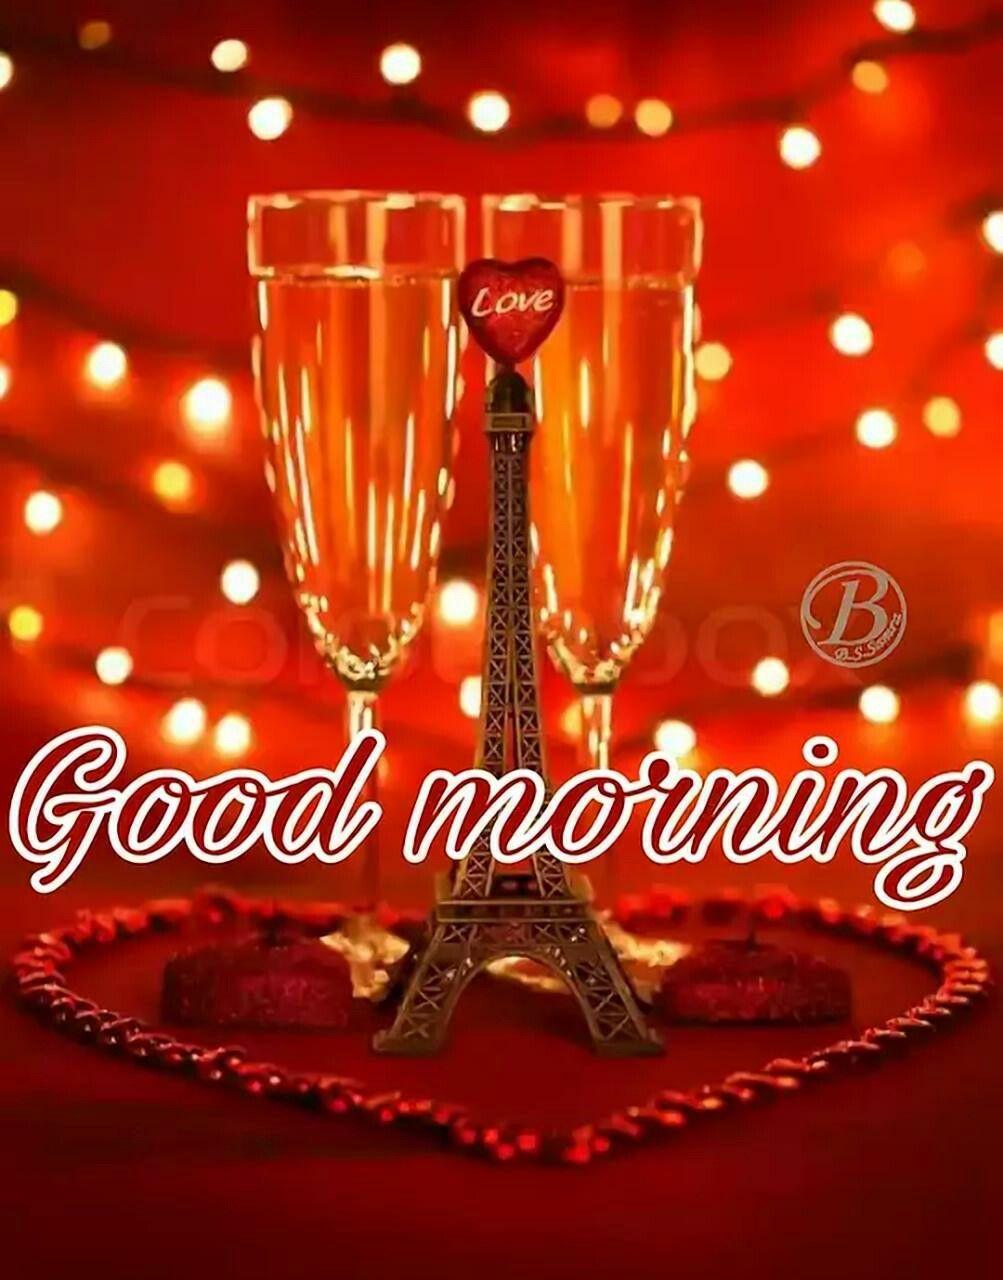 Pin By Sutapa Sengupta On Good Morning Alcoholic Drinks Alcohol Rose Wine